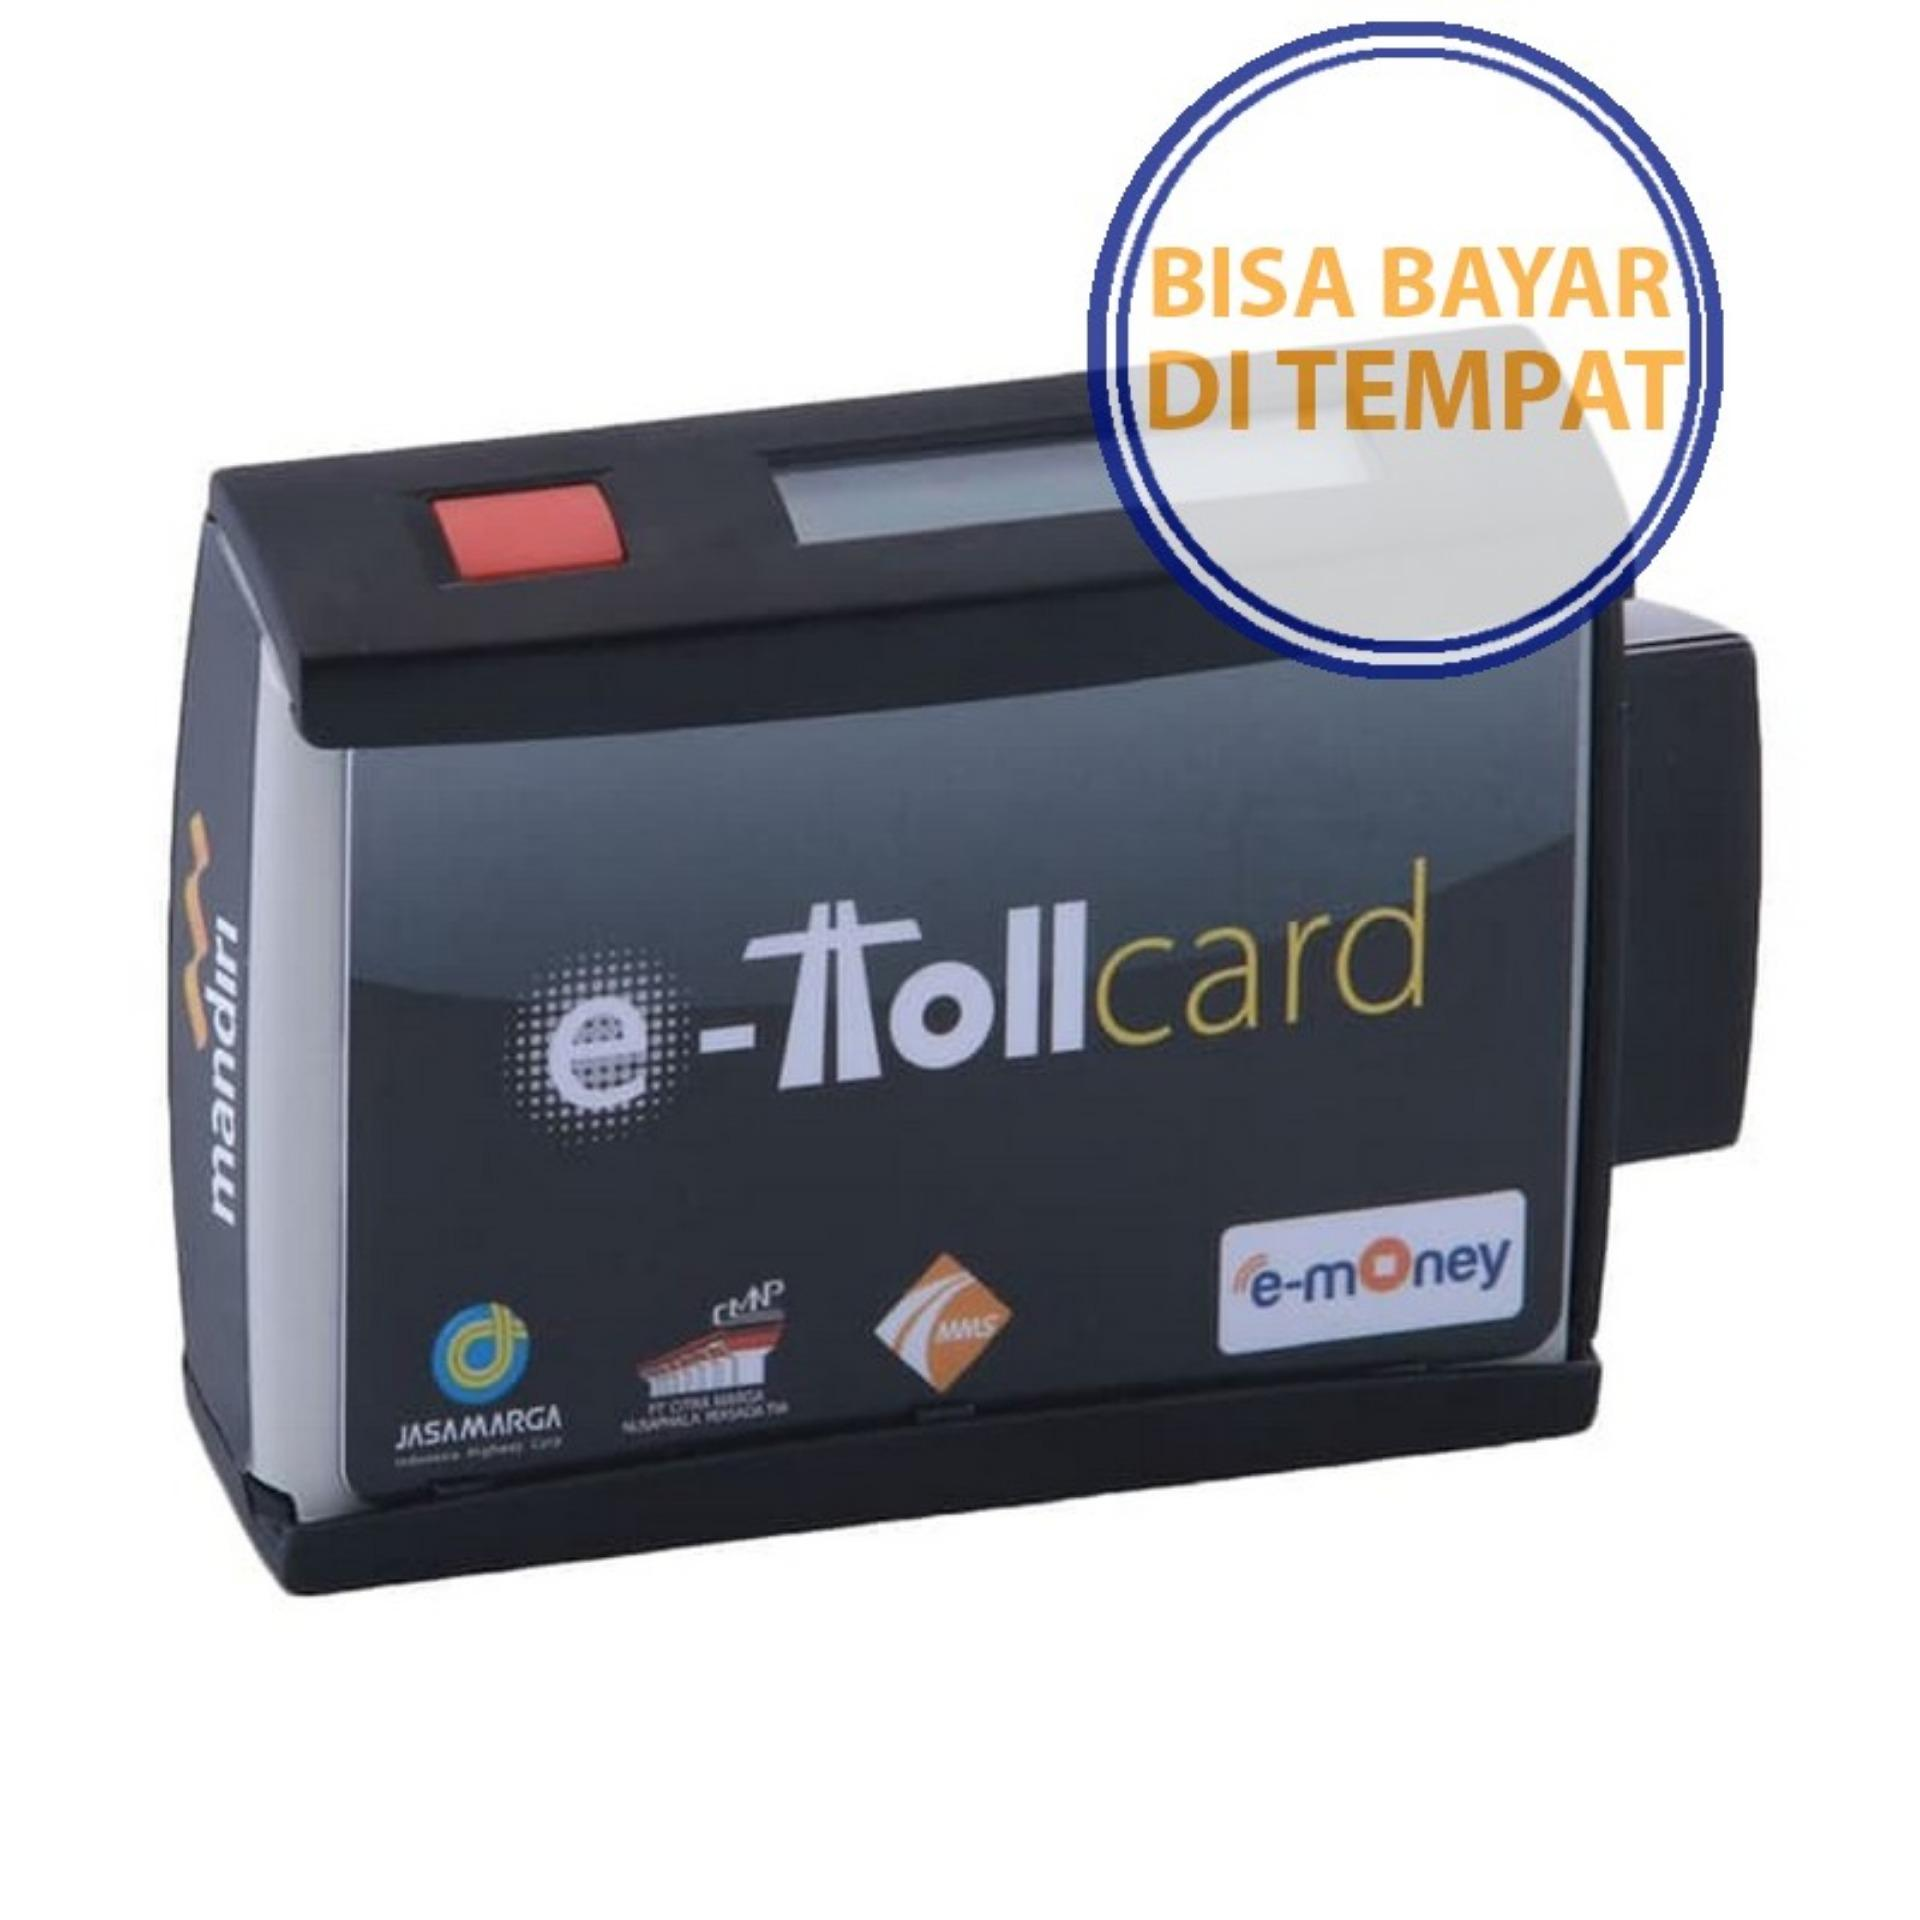 Buy Sell Cheapest Promo E Toll Best Quality Product Deals Emoney Mandiri Custom Gratis Tongtol Saat Ini Mesin Etoll Pass On Board Unit Obu